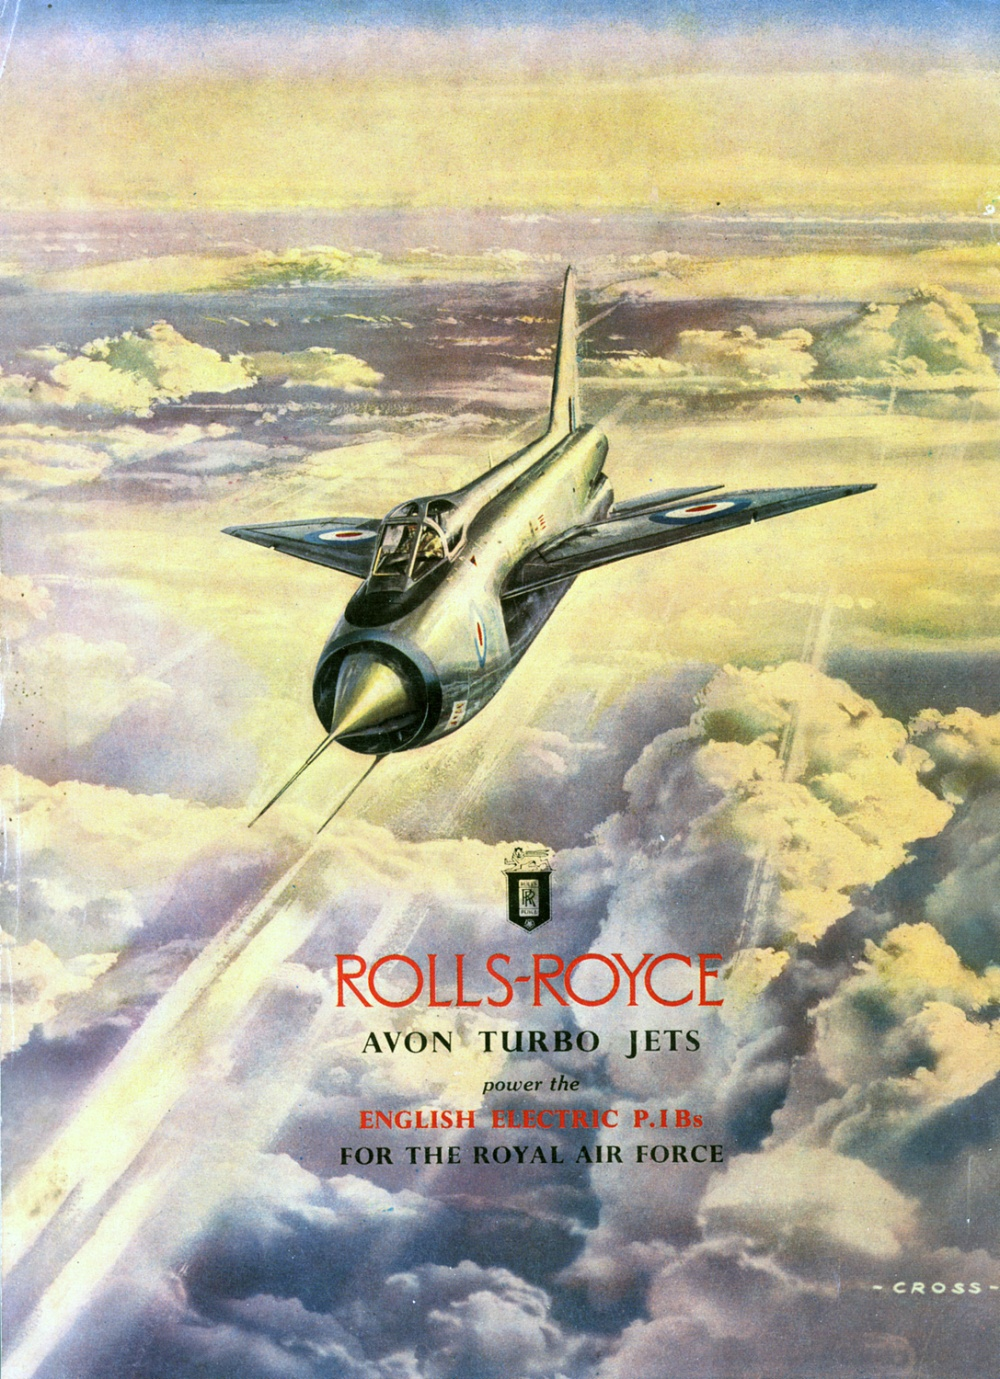 Ad-Rolls-Royce-Avon-Lightning-Aeronautics-4-58-1500v